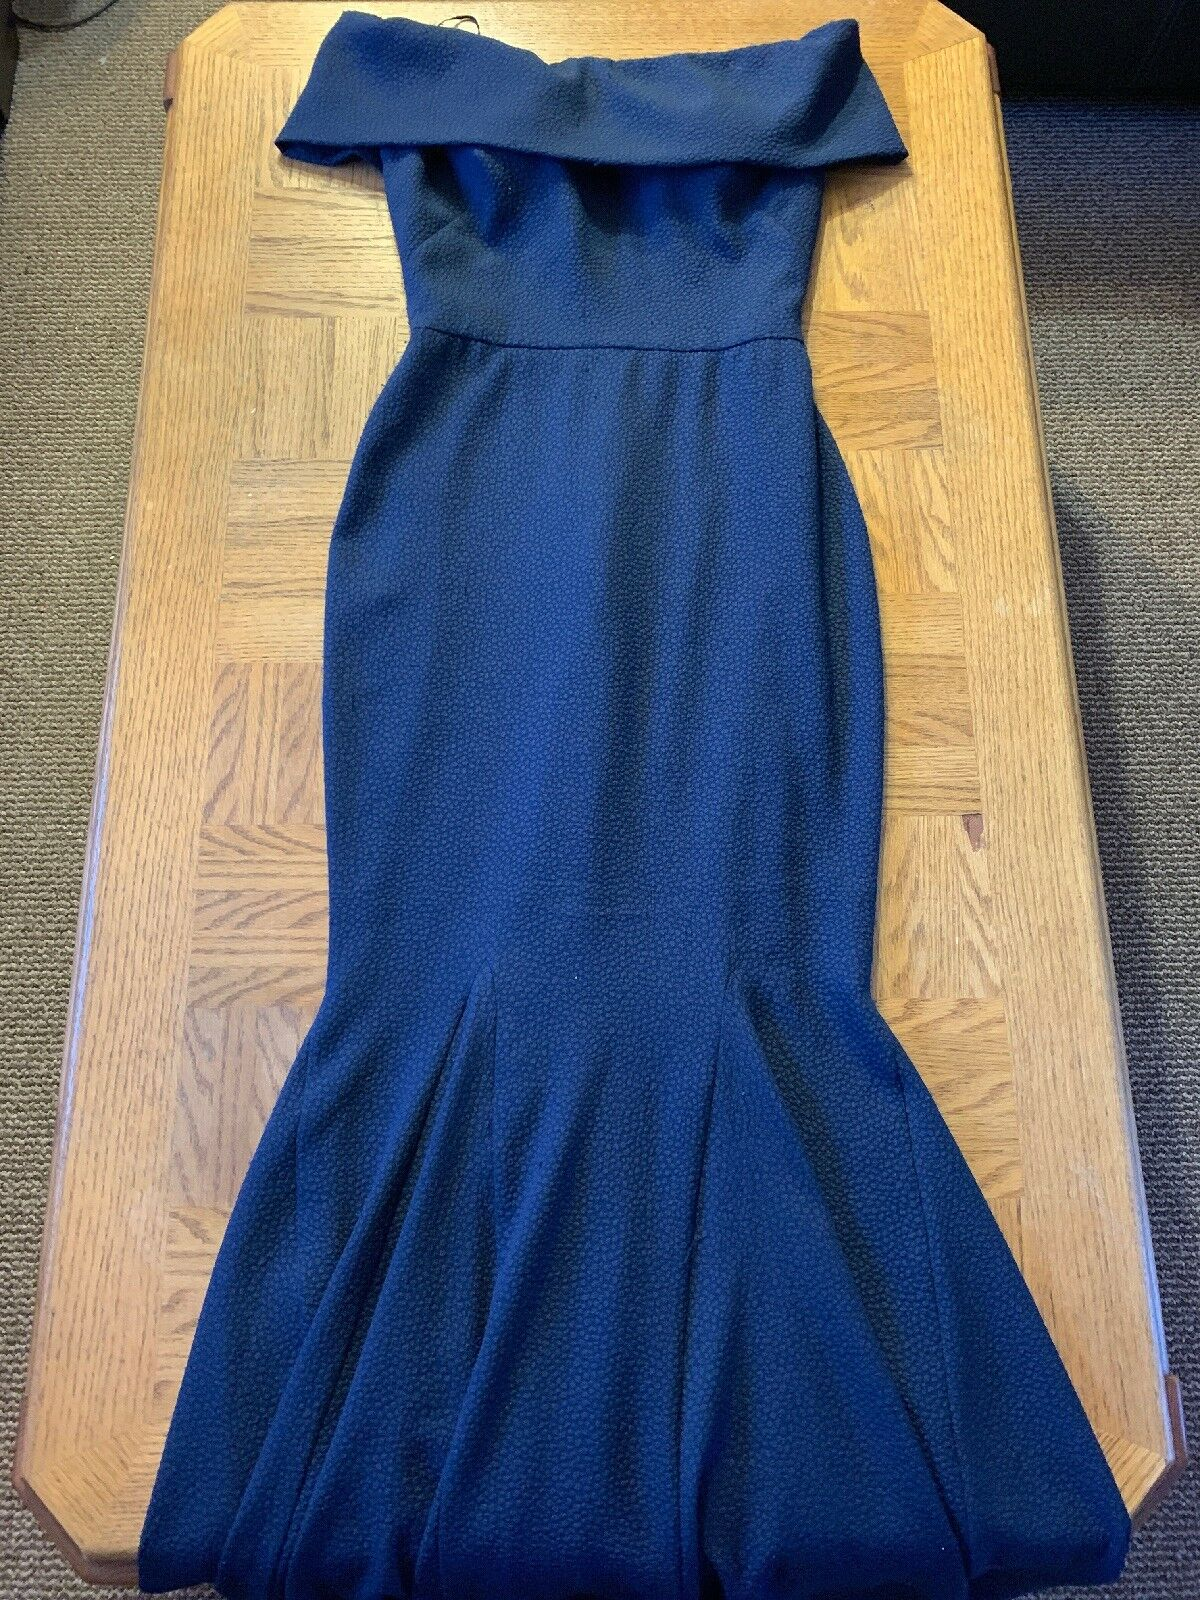 Womens Nicole Bakti Dress Size 6 0122